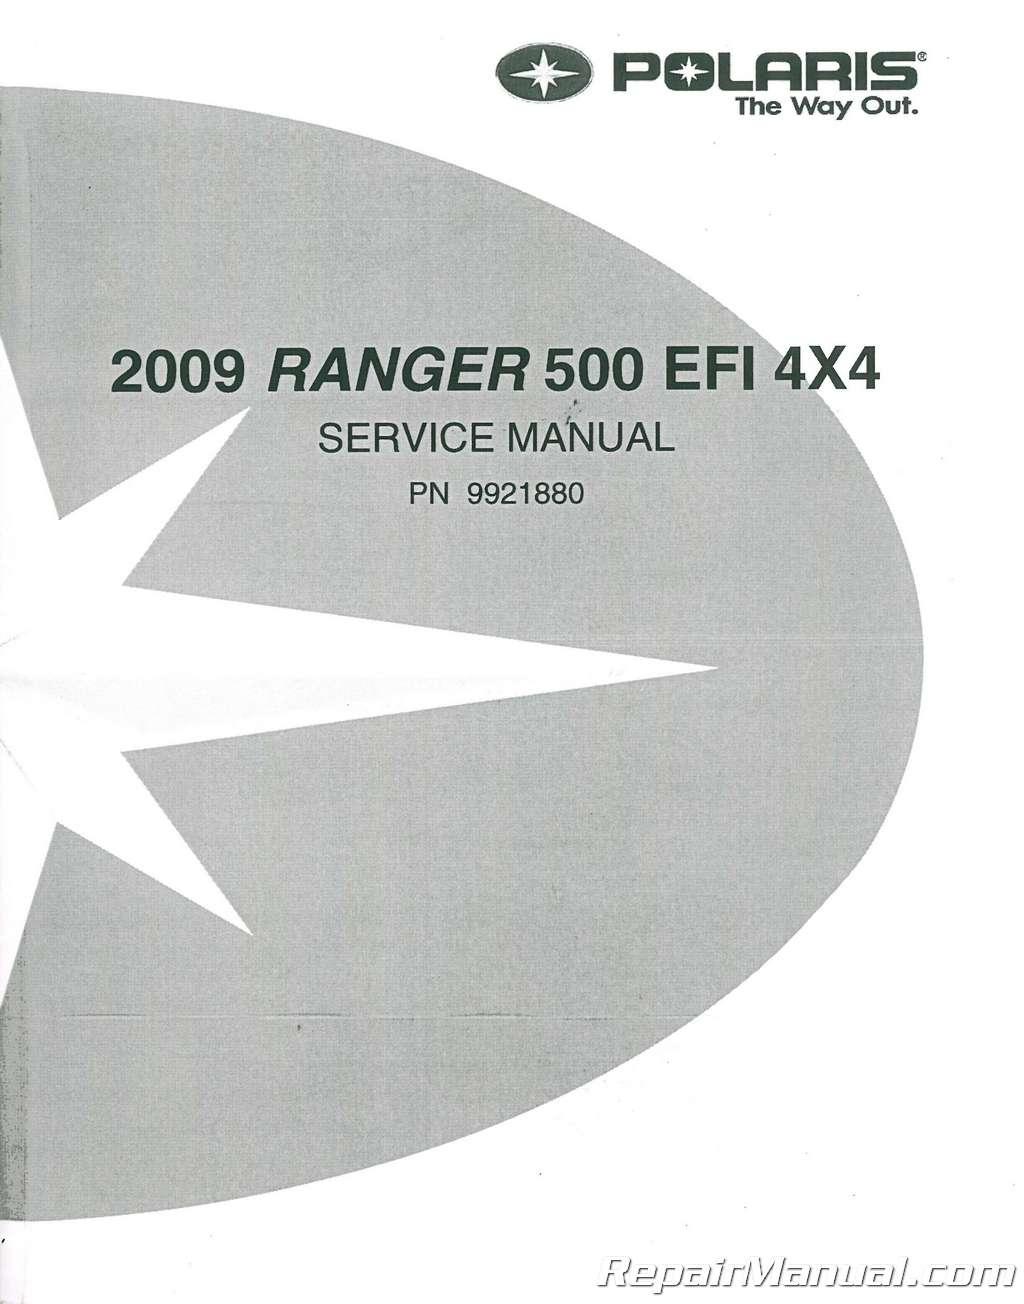 polaris ranger 500 parts manual